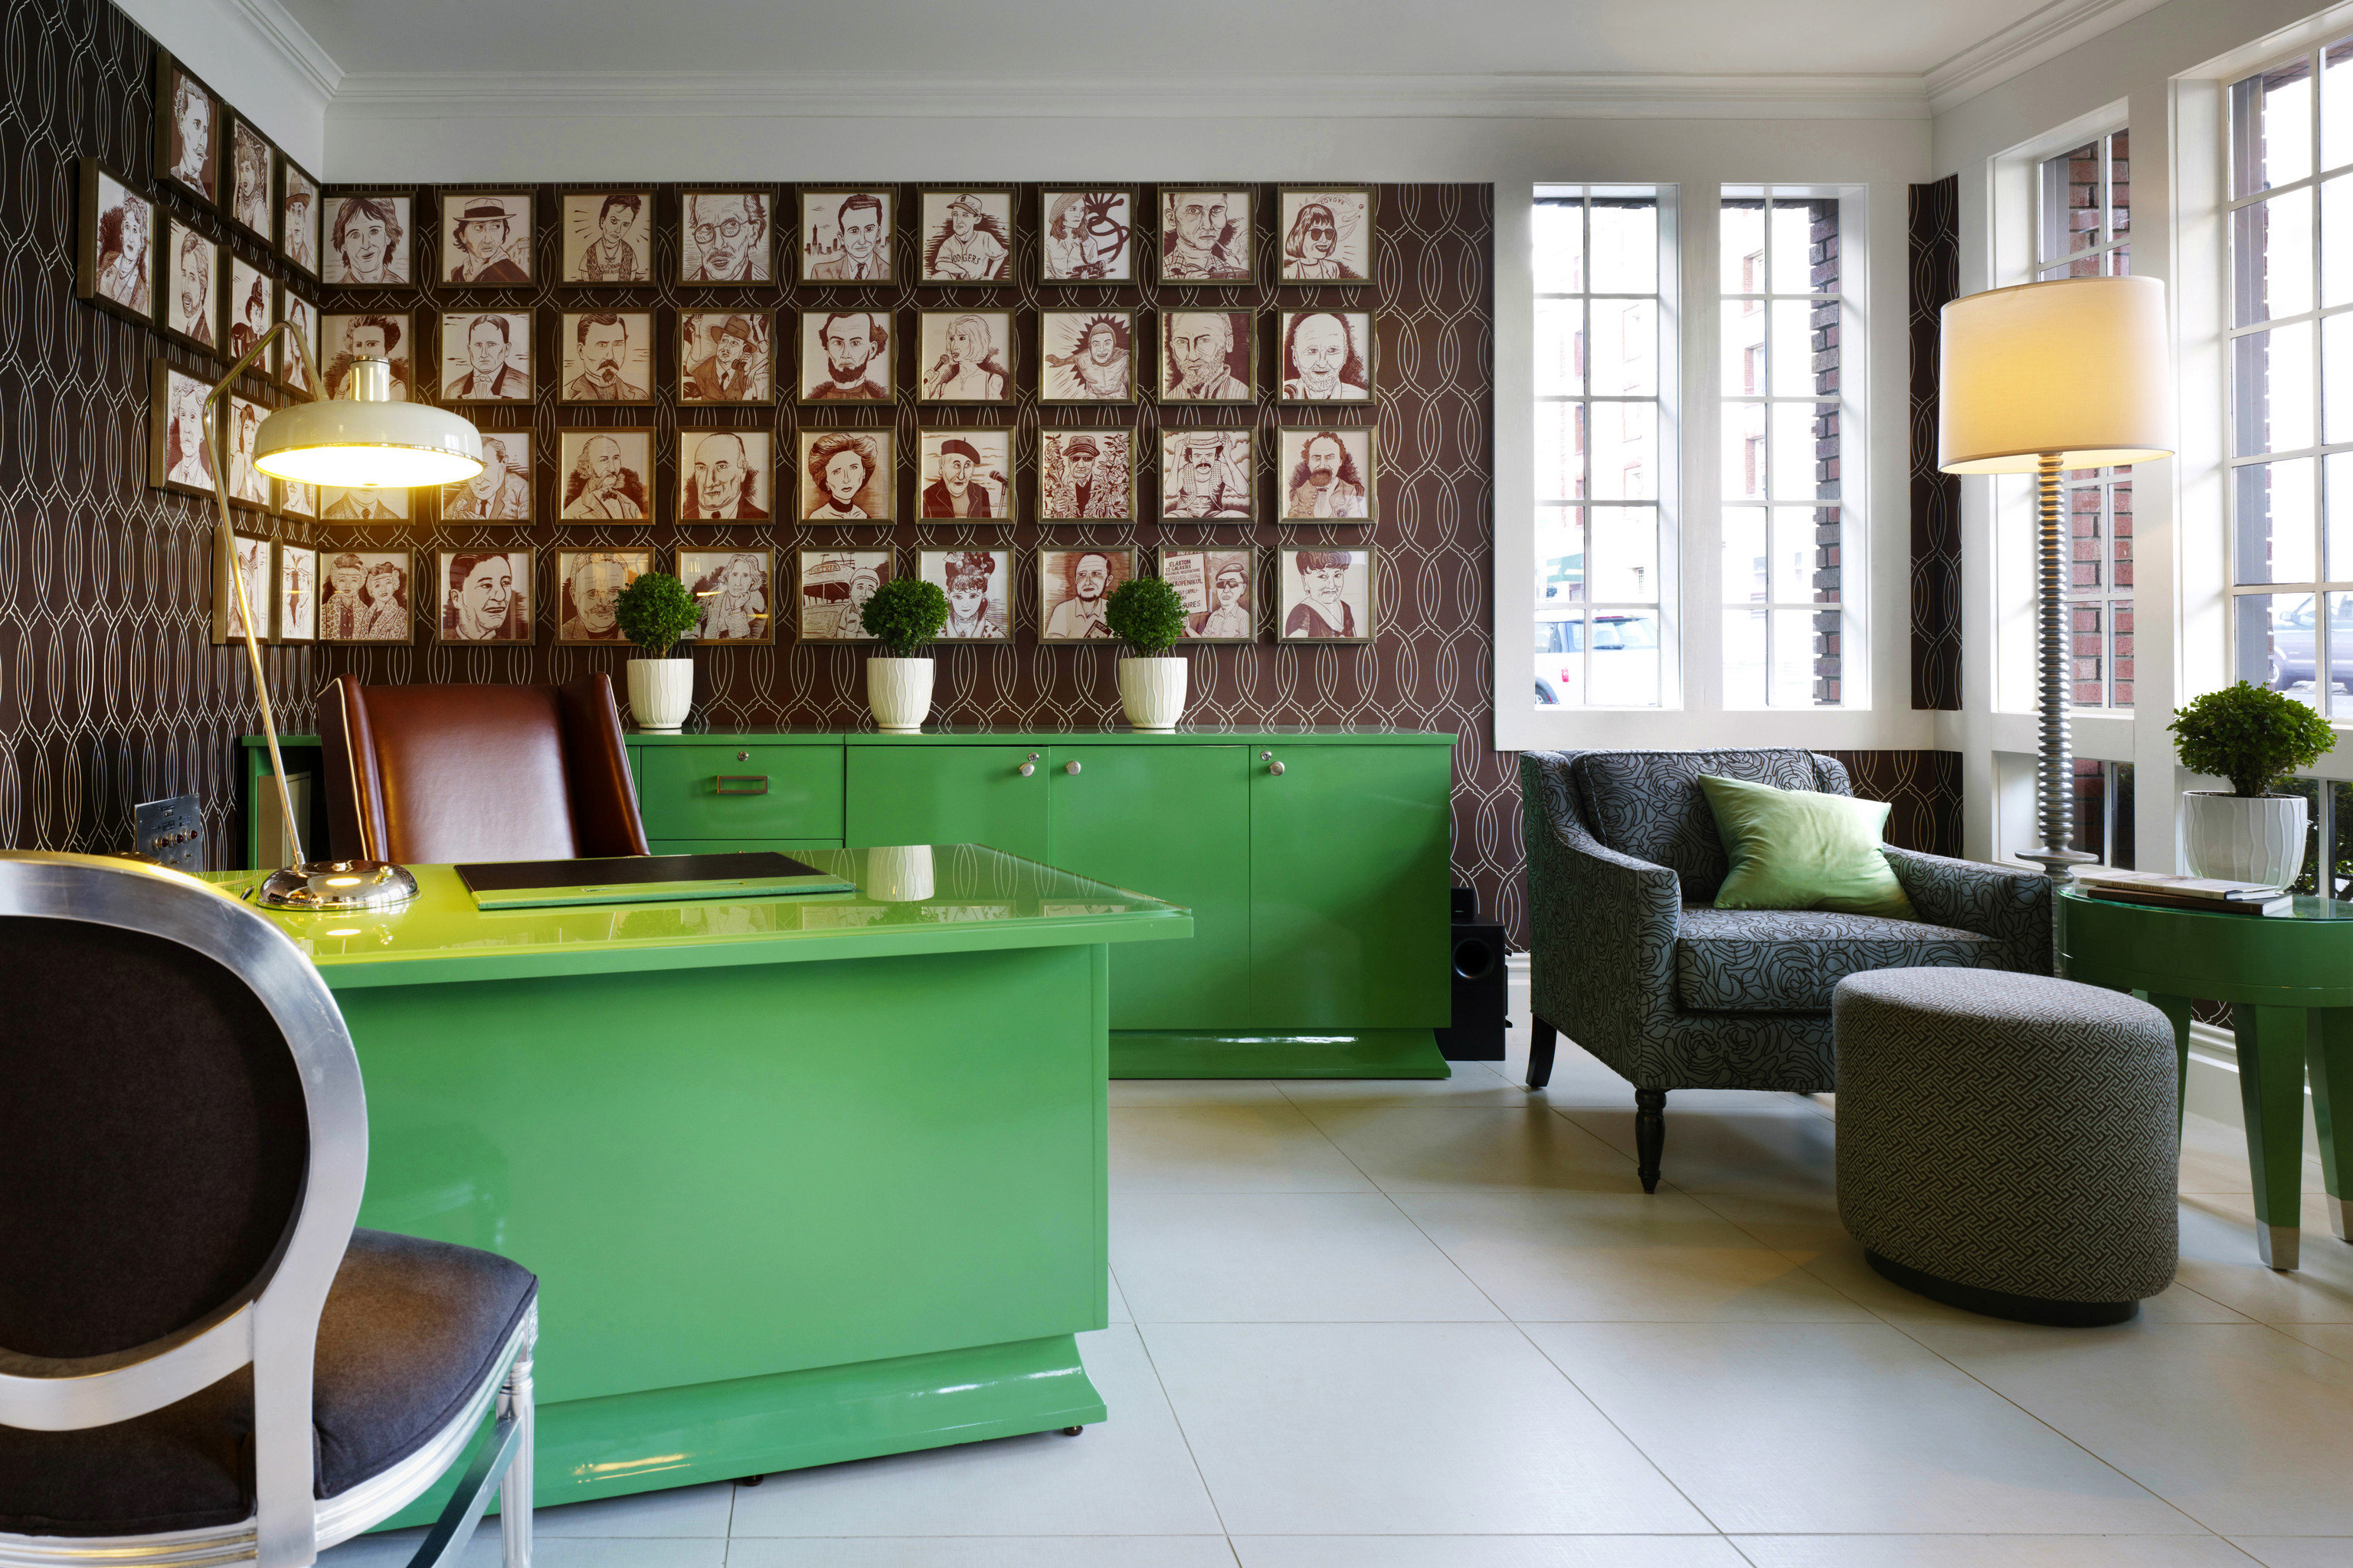 green living room property condominium home Lobby office waiting room flooring